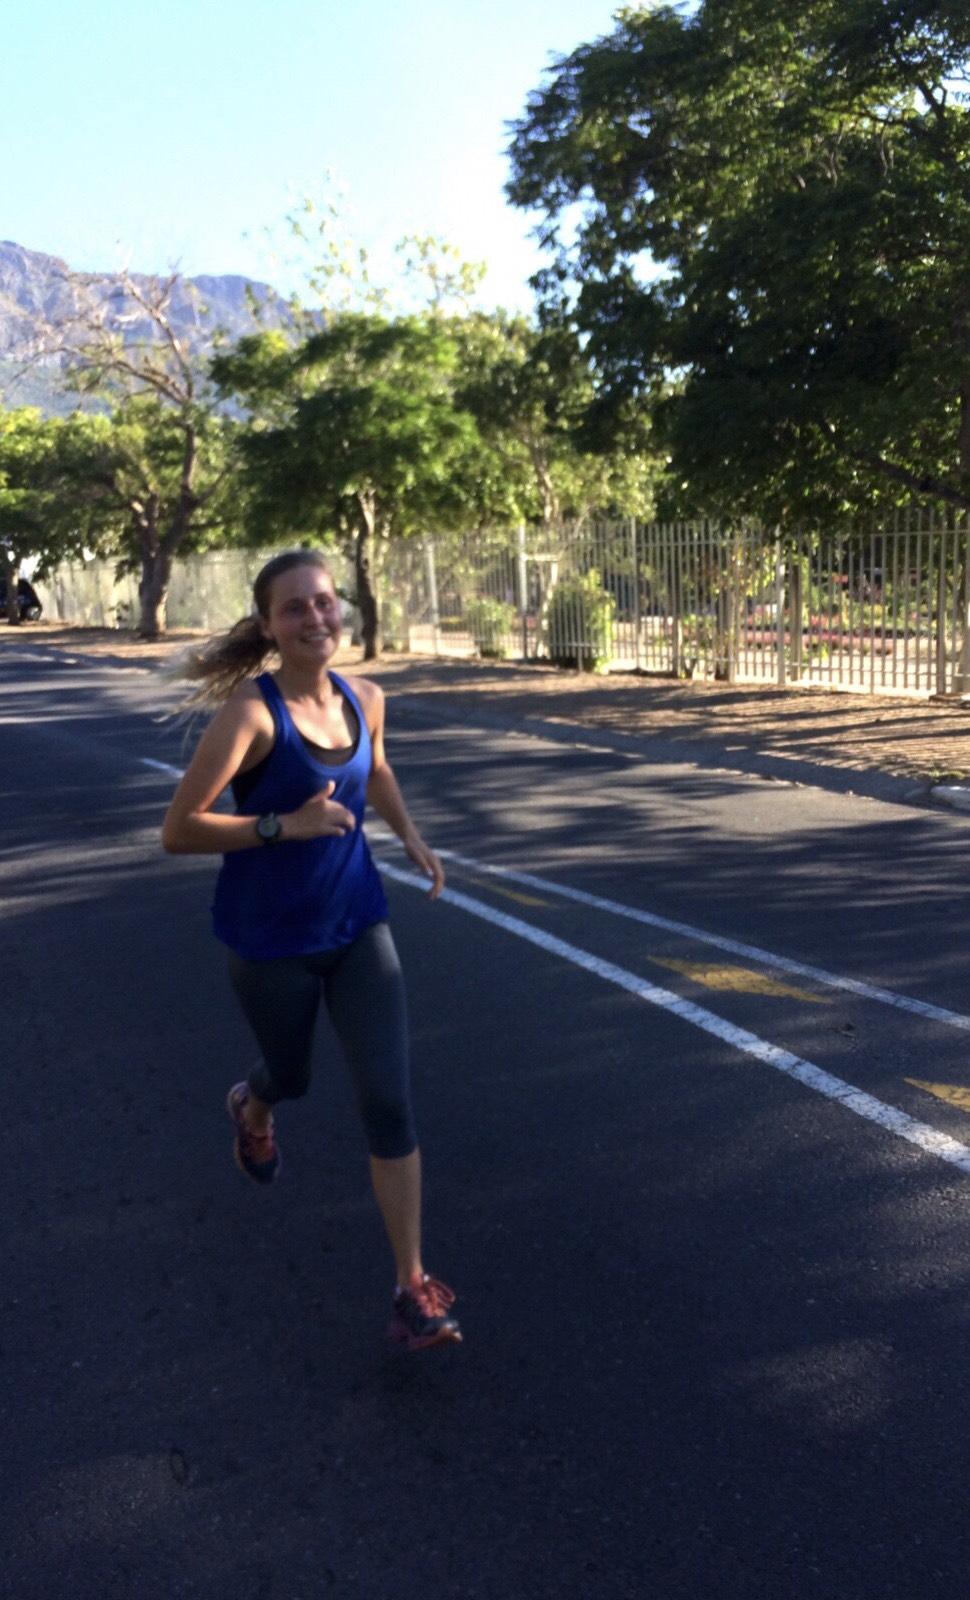 Running Tips from Everyday Runners - Dev Basson